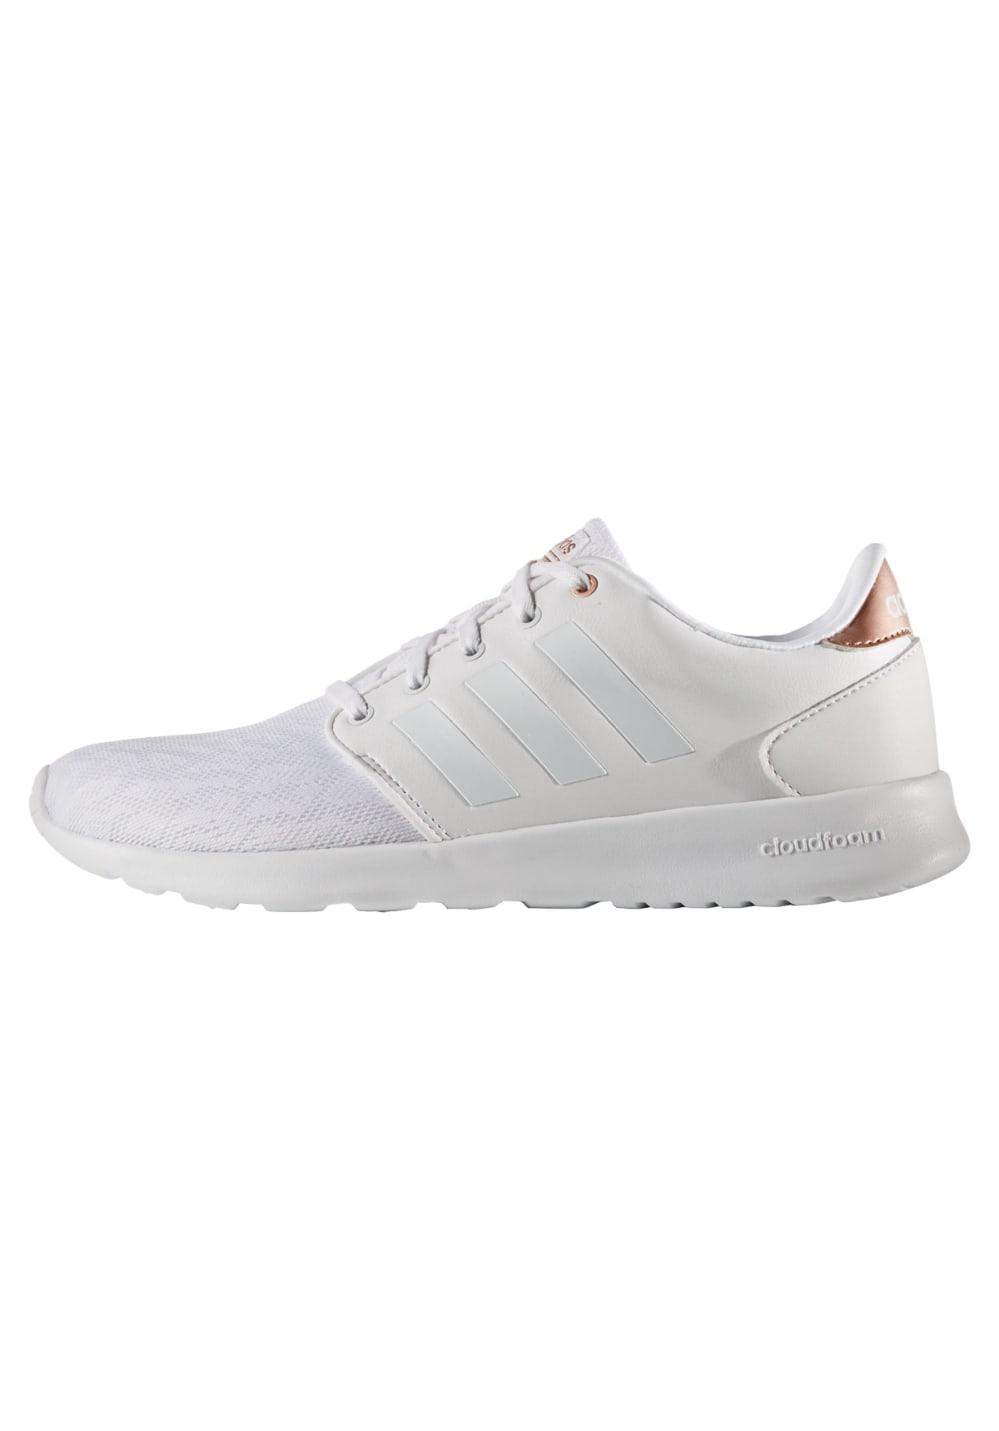 adidas neo Cloudfoam QT Racer - Sneaker für Damen - Grau